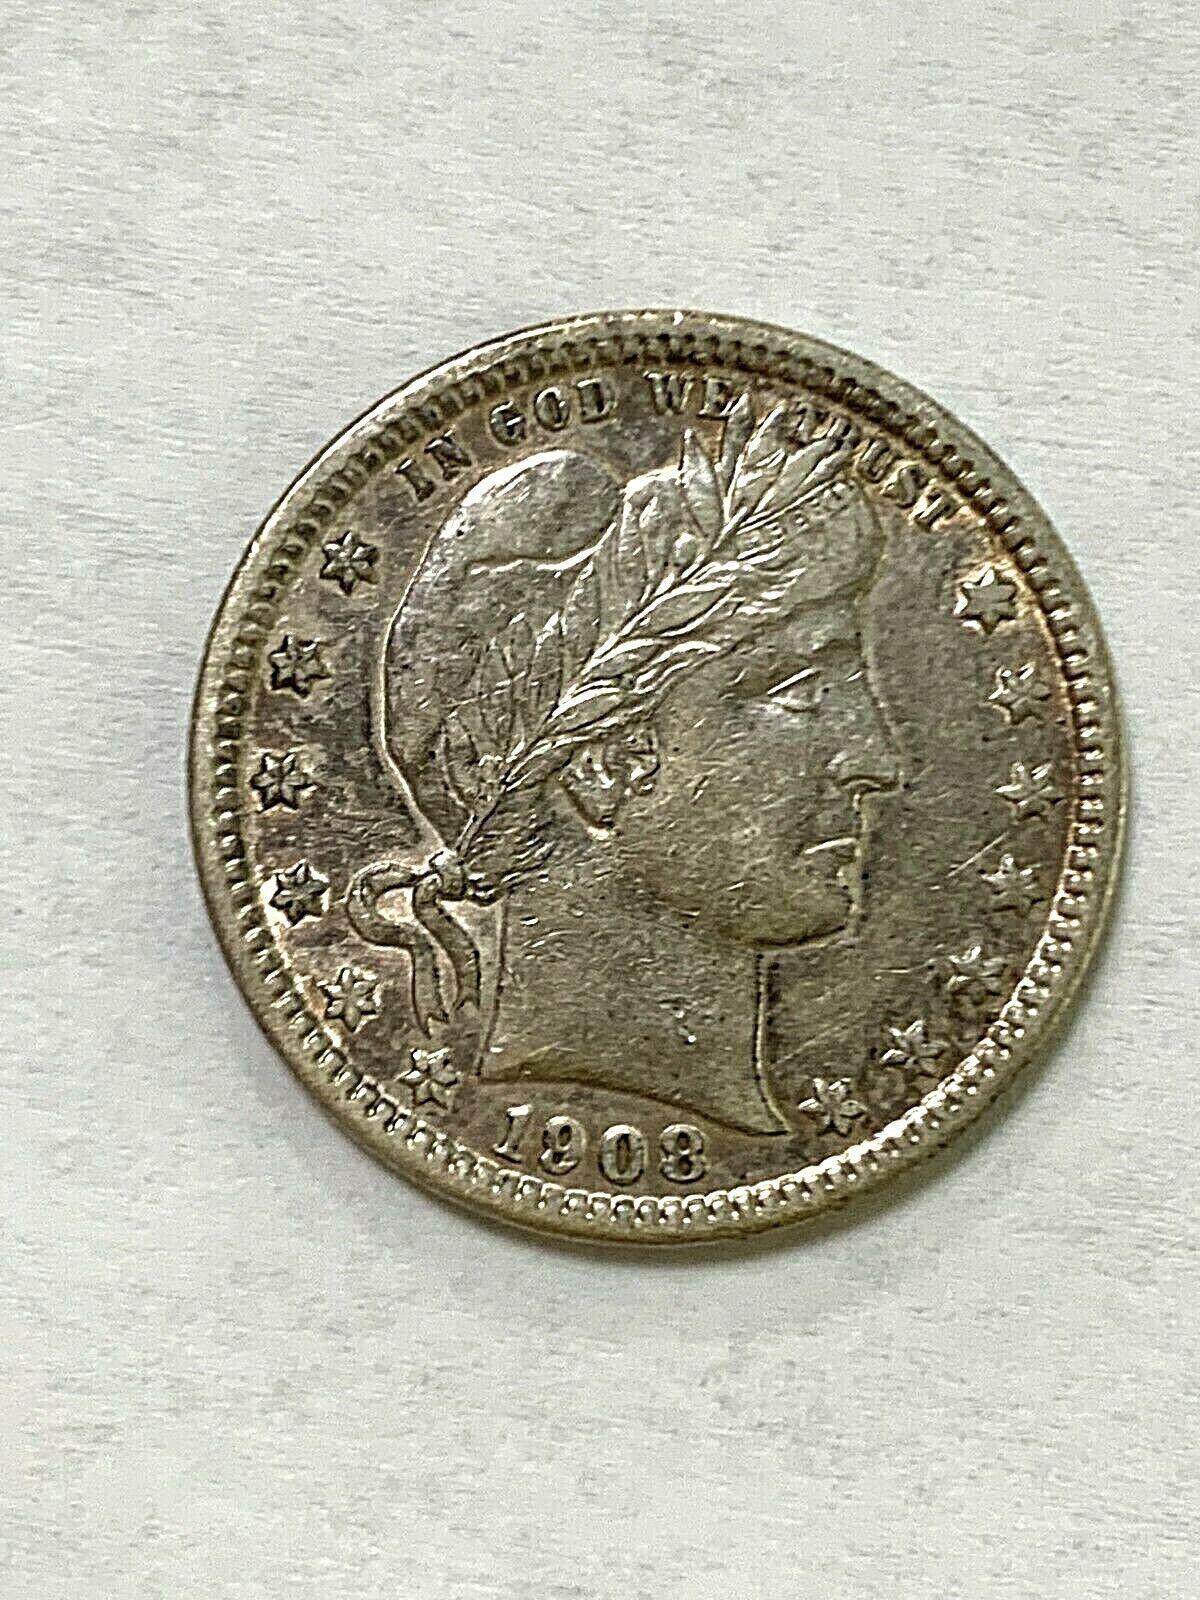 1908-D Barber Quarter  - $69.99